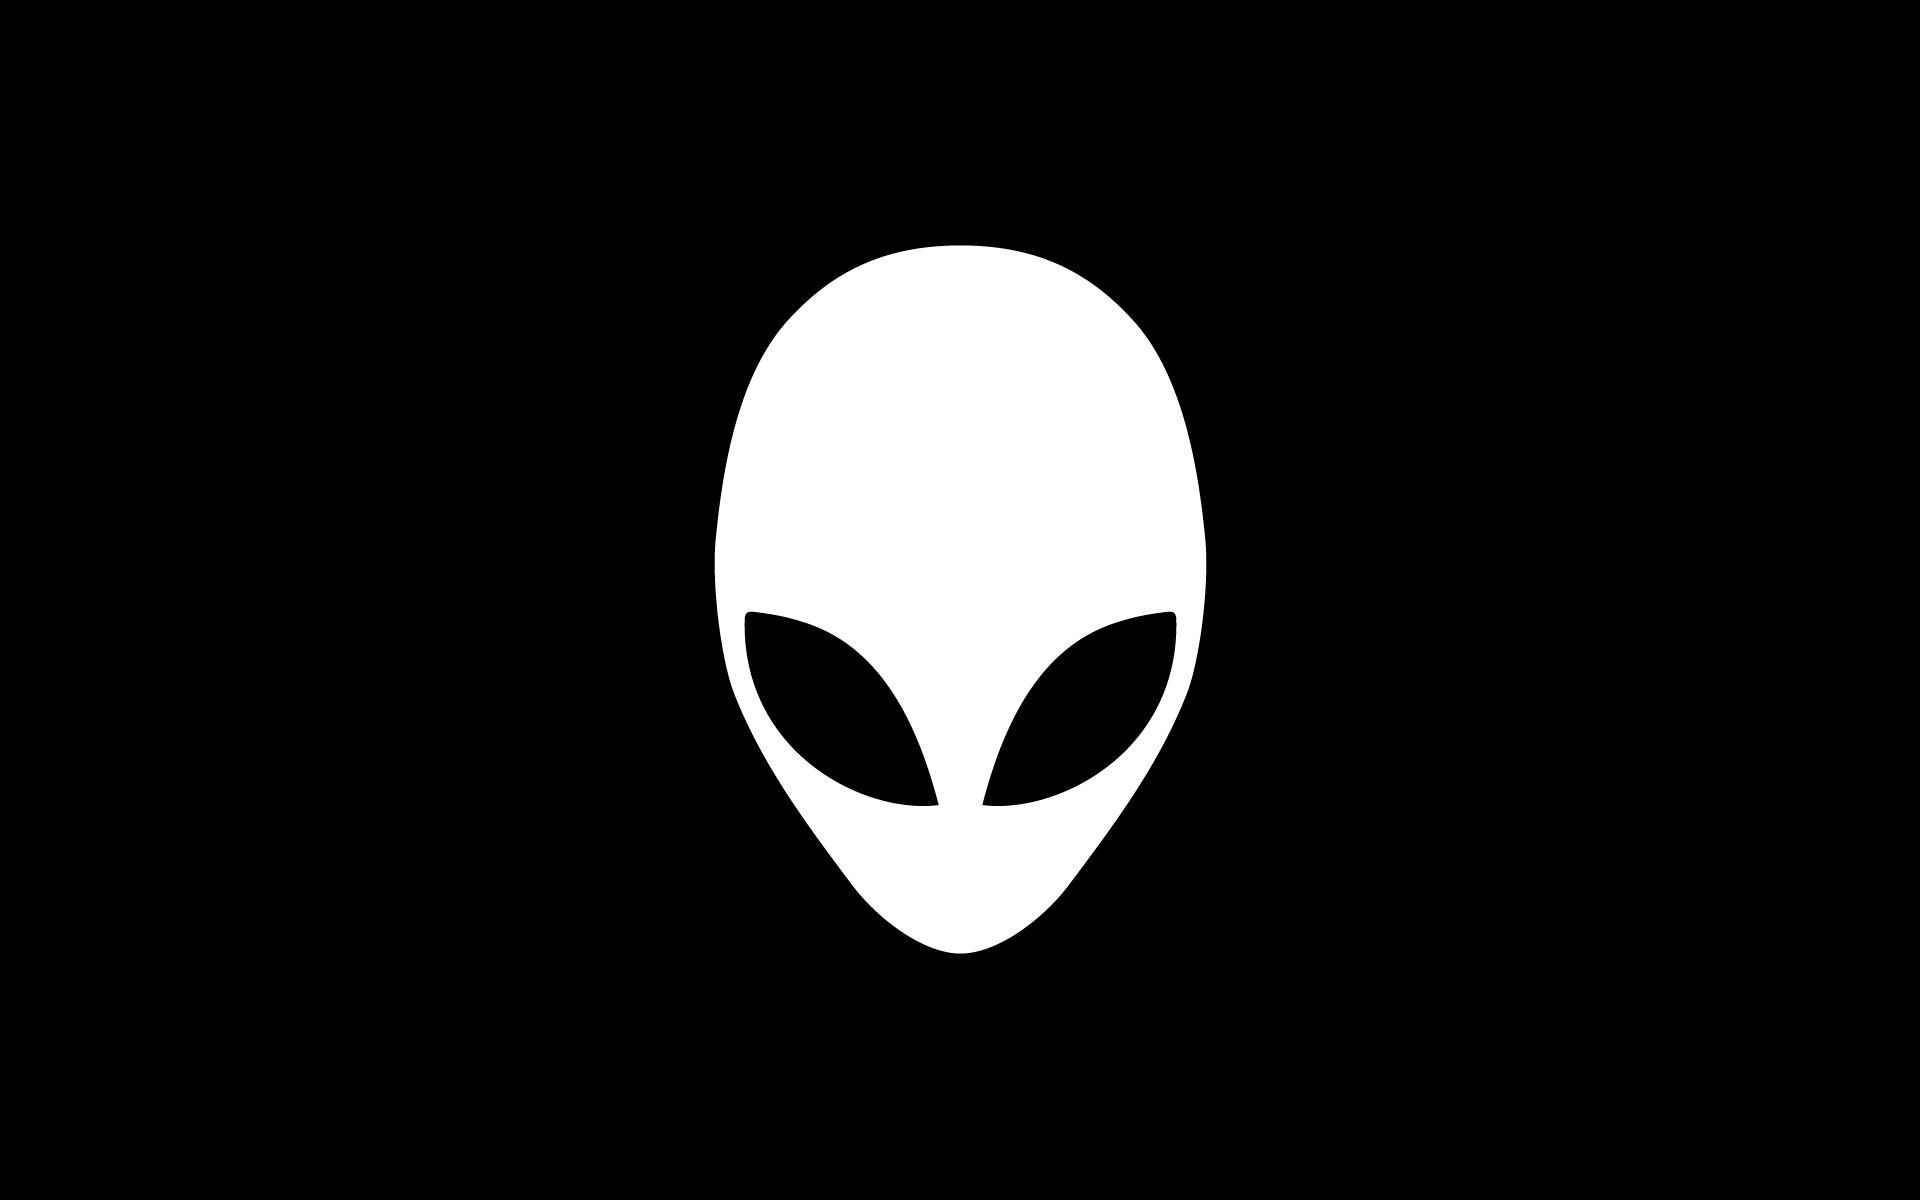 extraterrestre logo